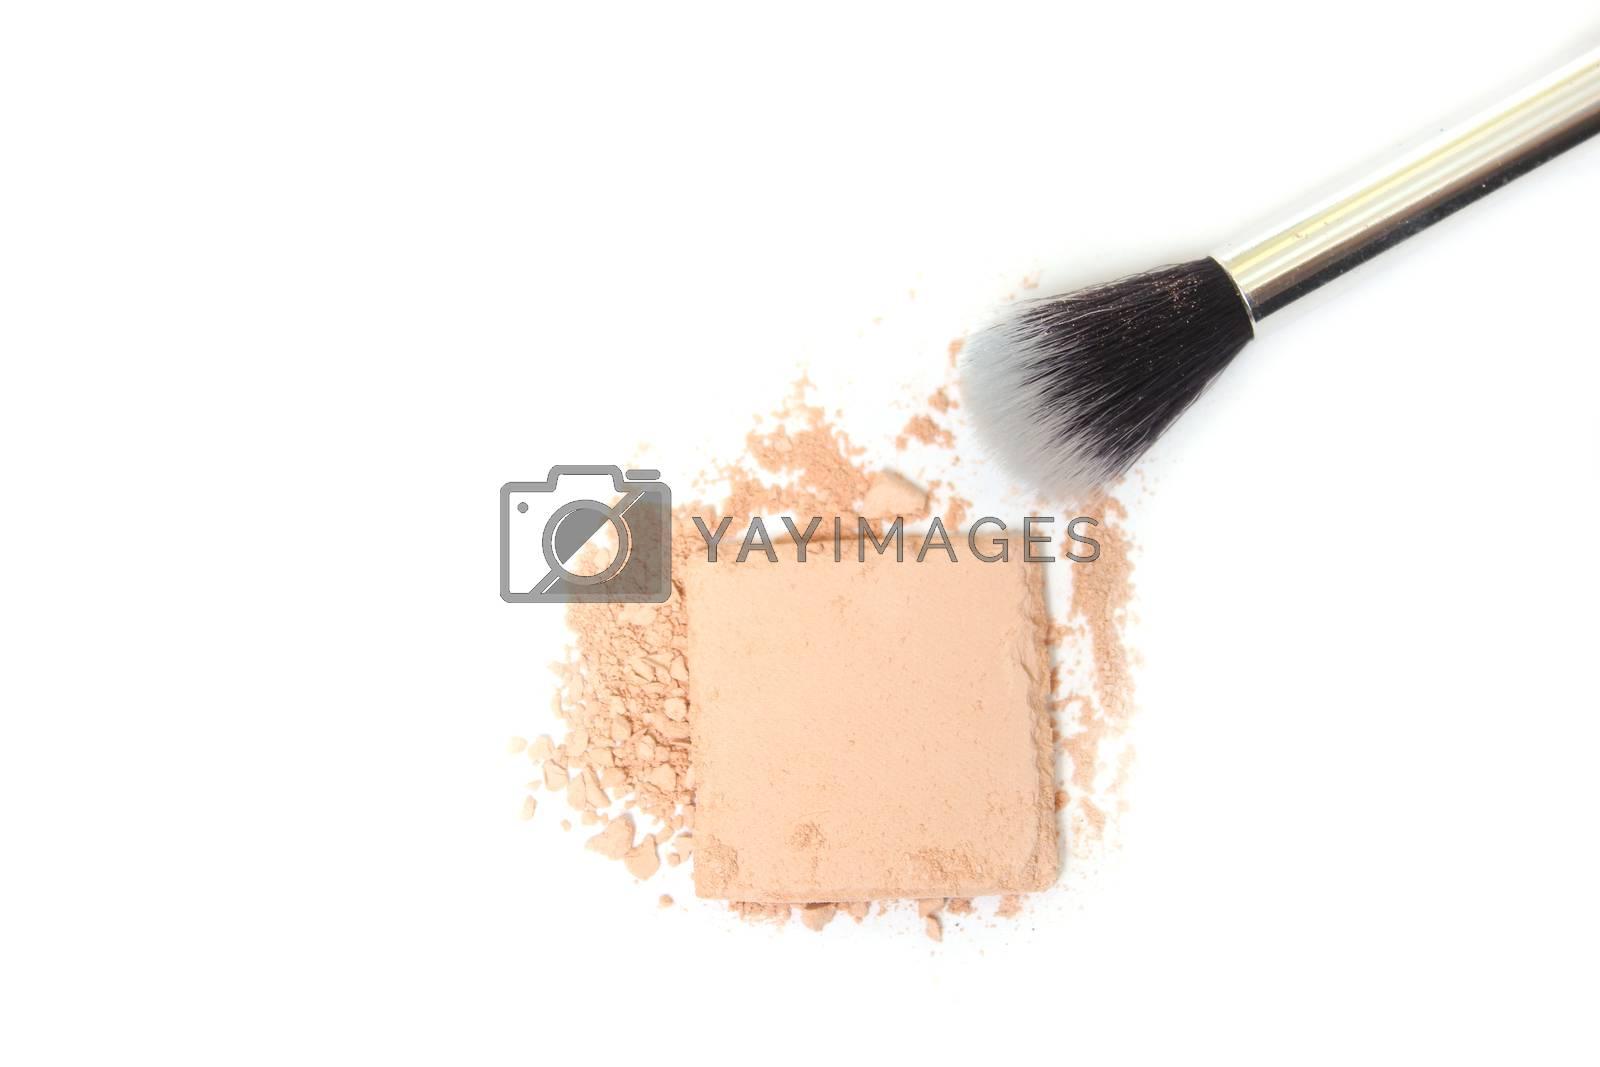 Broken Eyeshadow With Brush on White Background